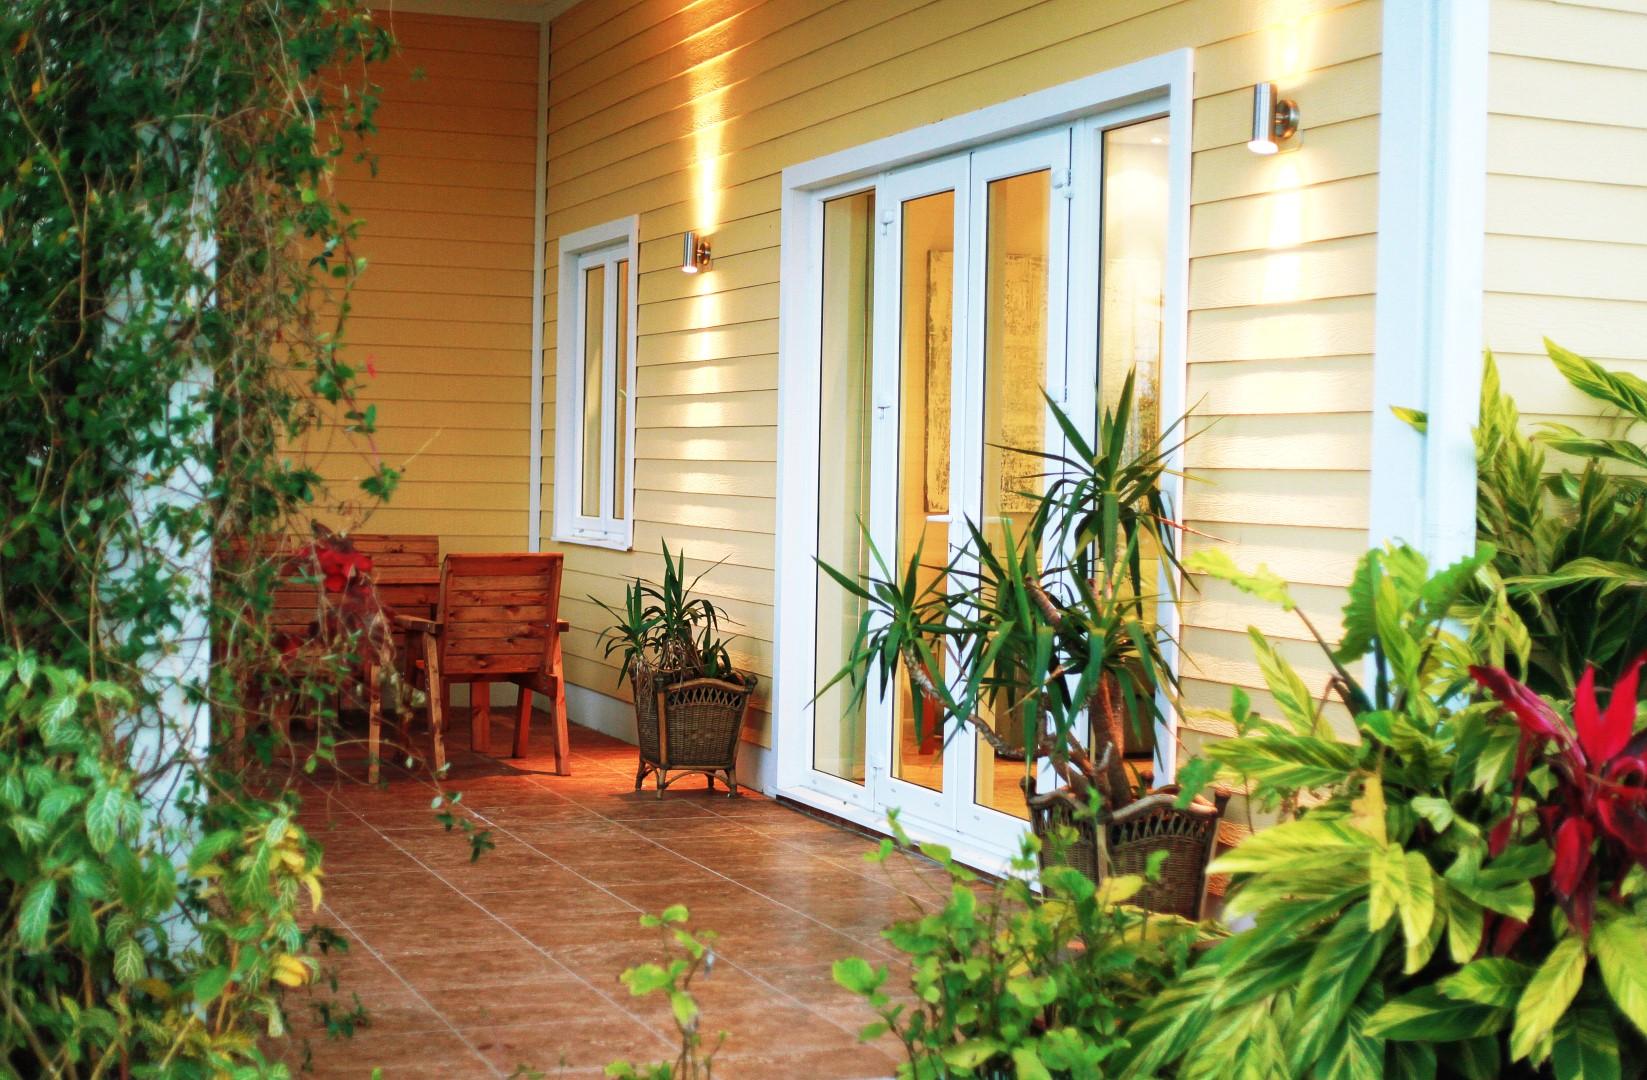 Welcome to Lucaya Gardens - Condominium ownership & short-term rentals